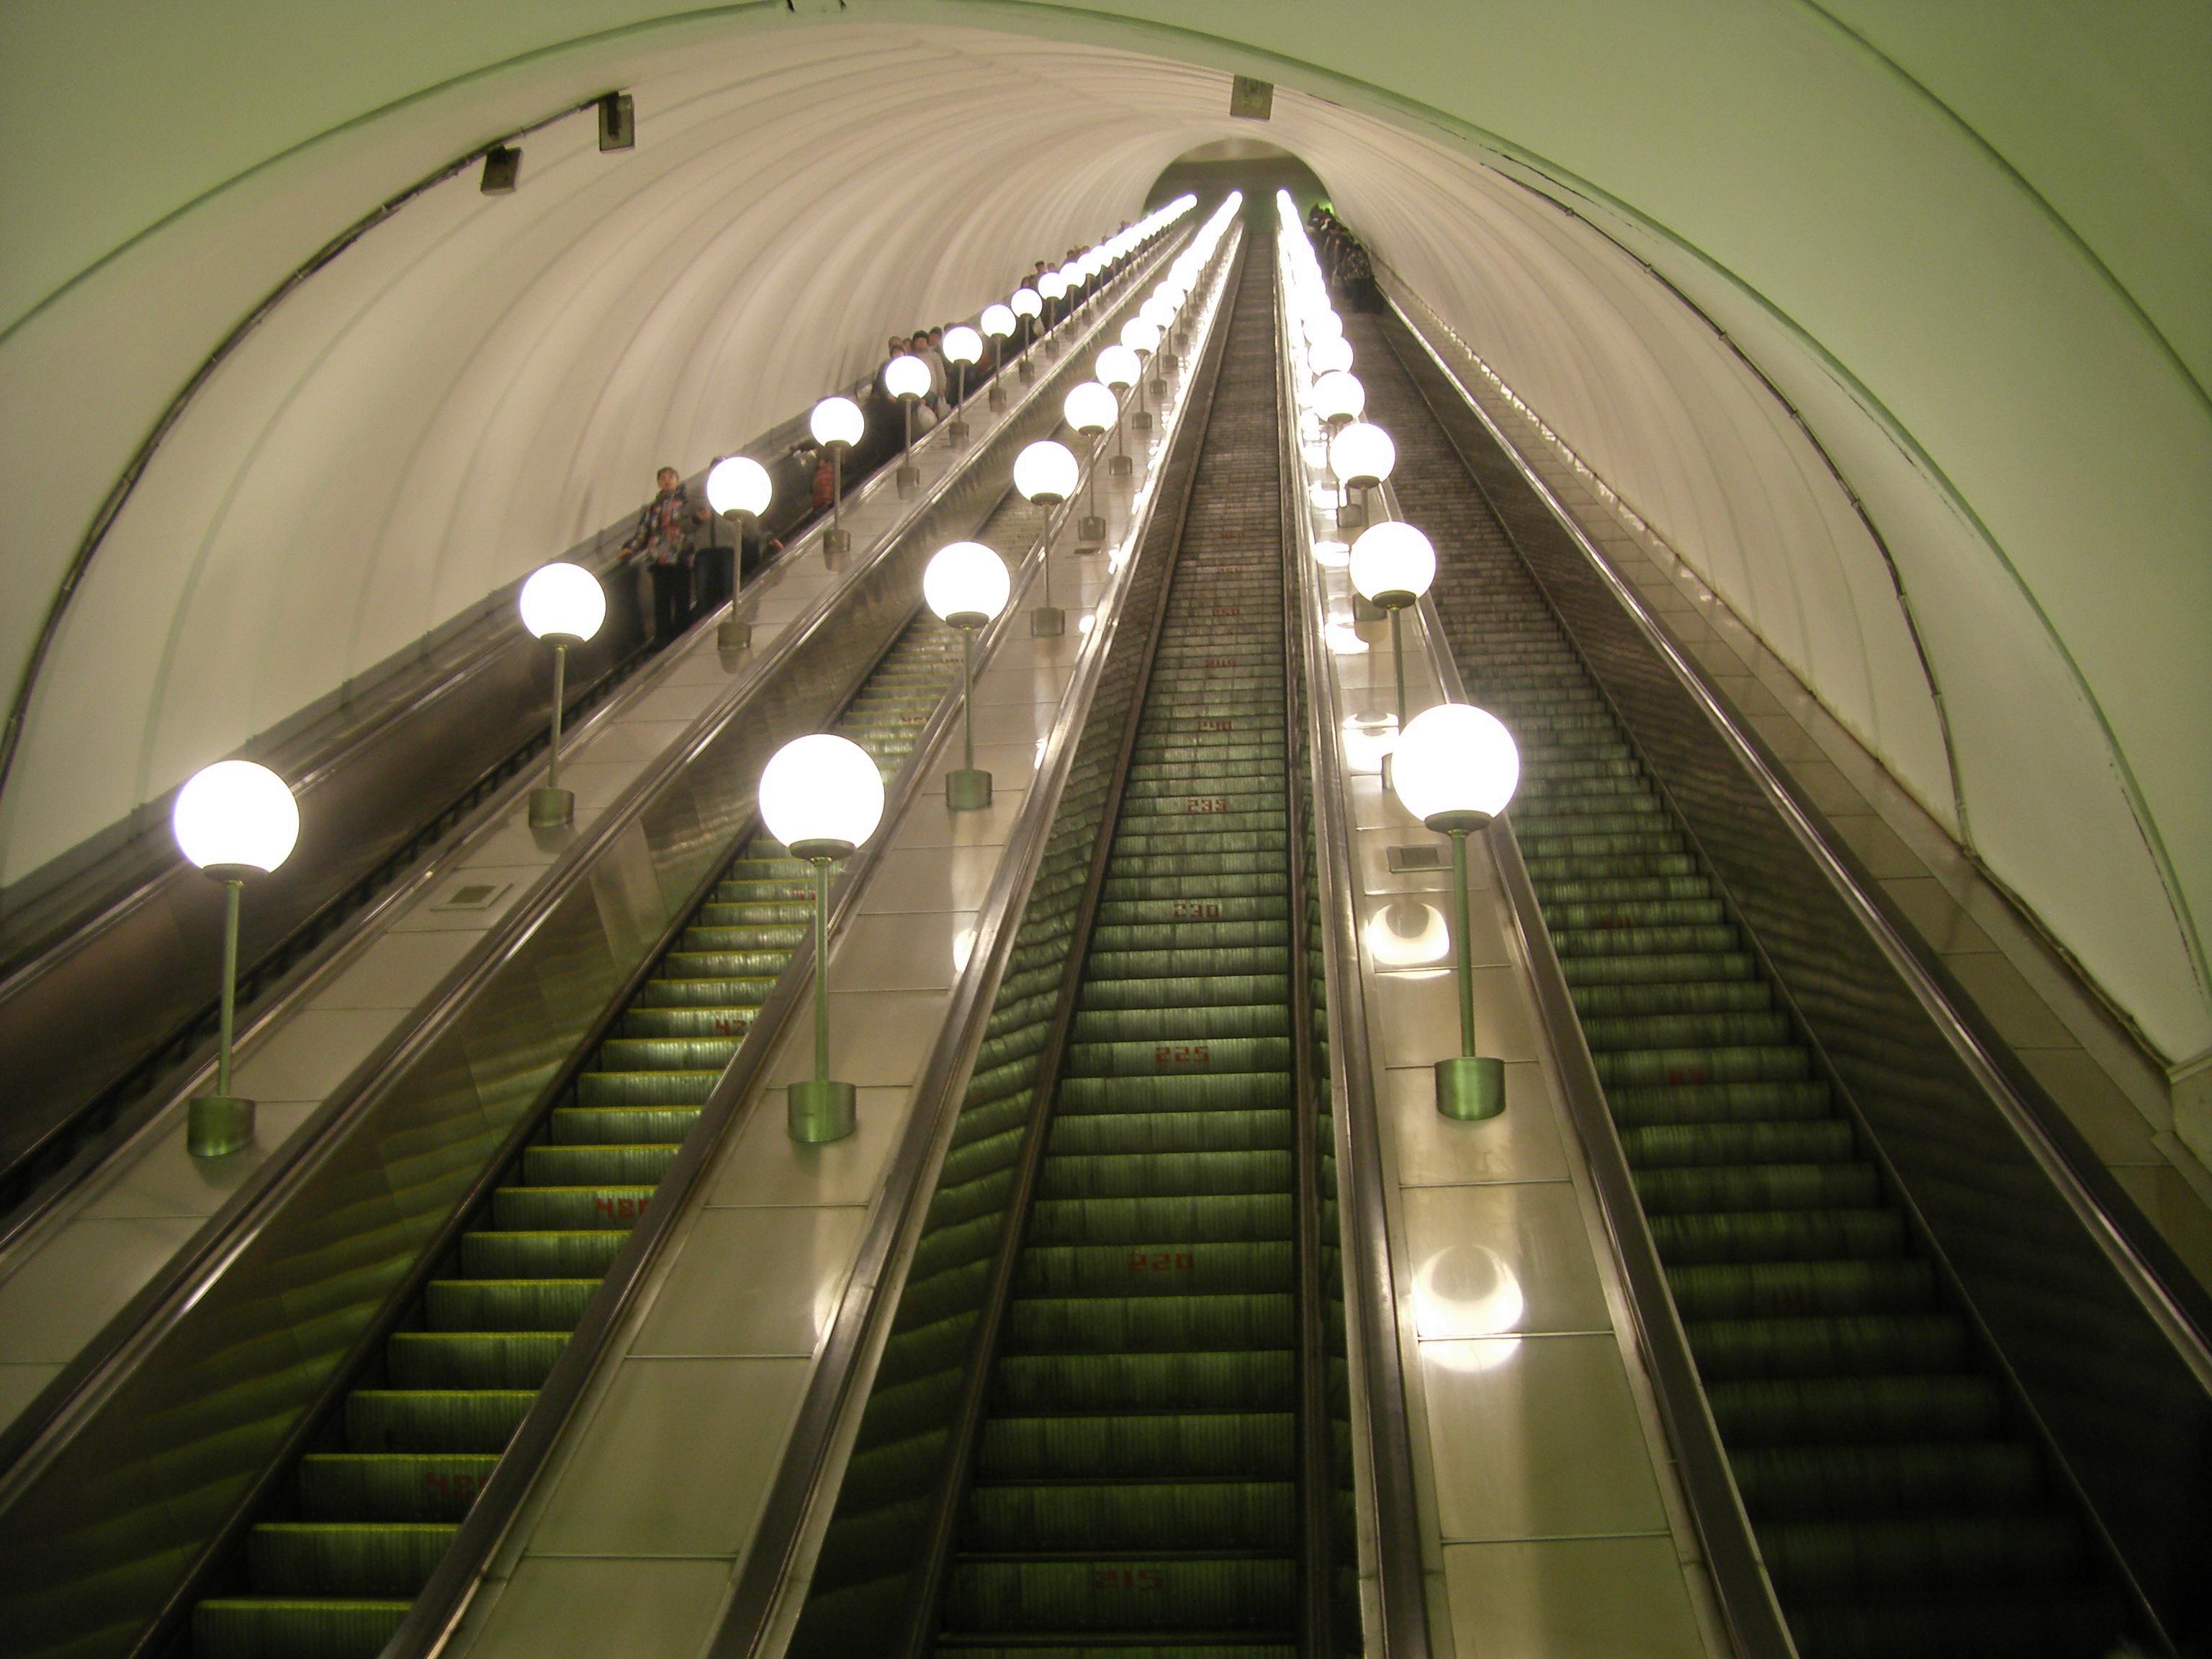 fileescalators at dubrovka metro stationjpg wikimedia